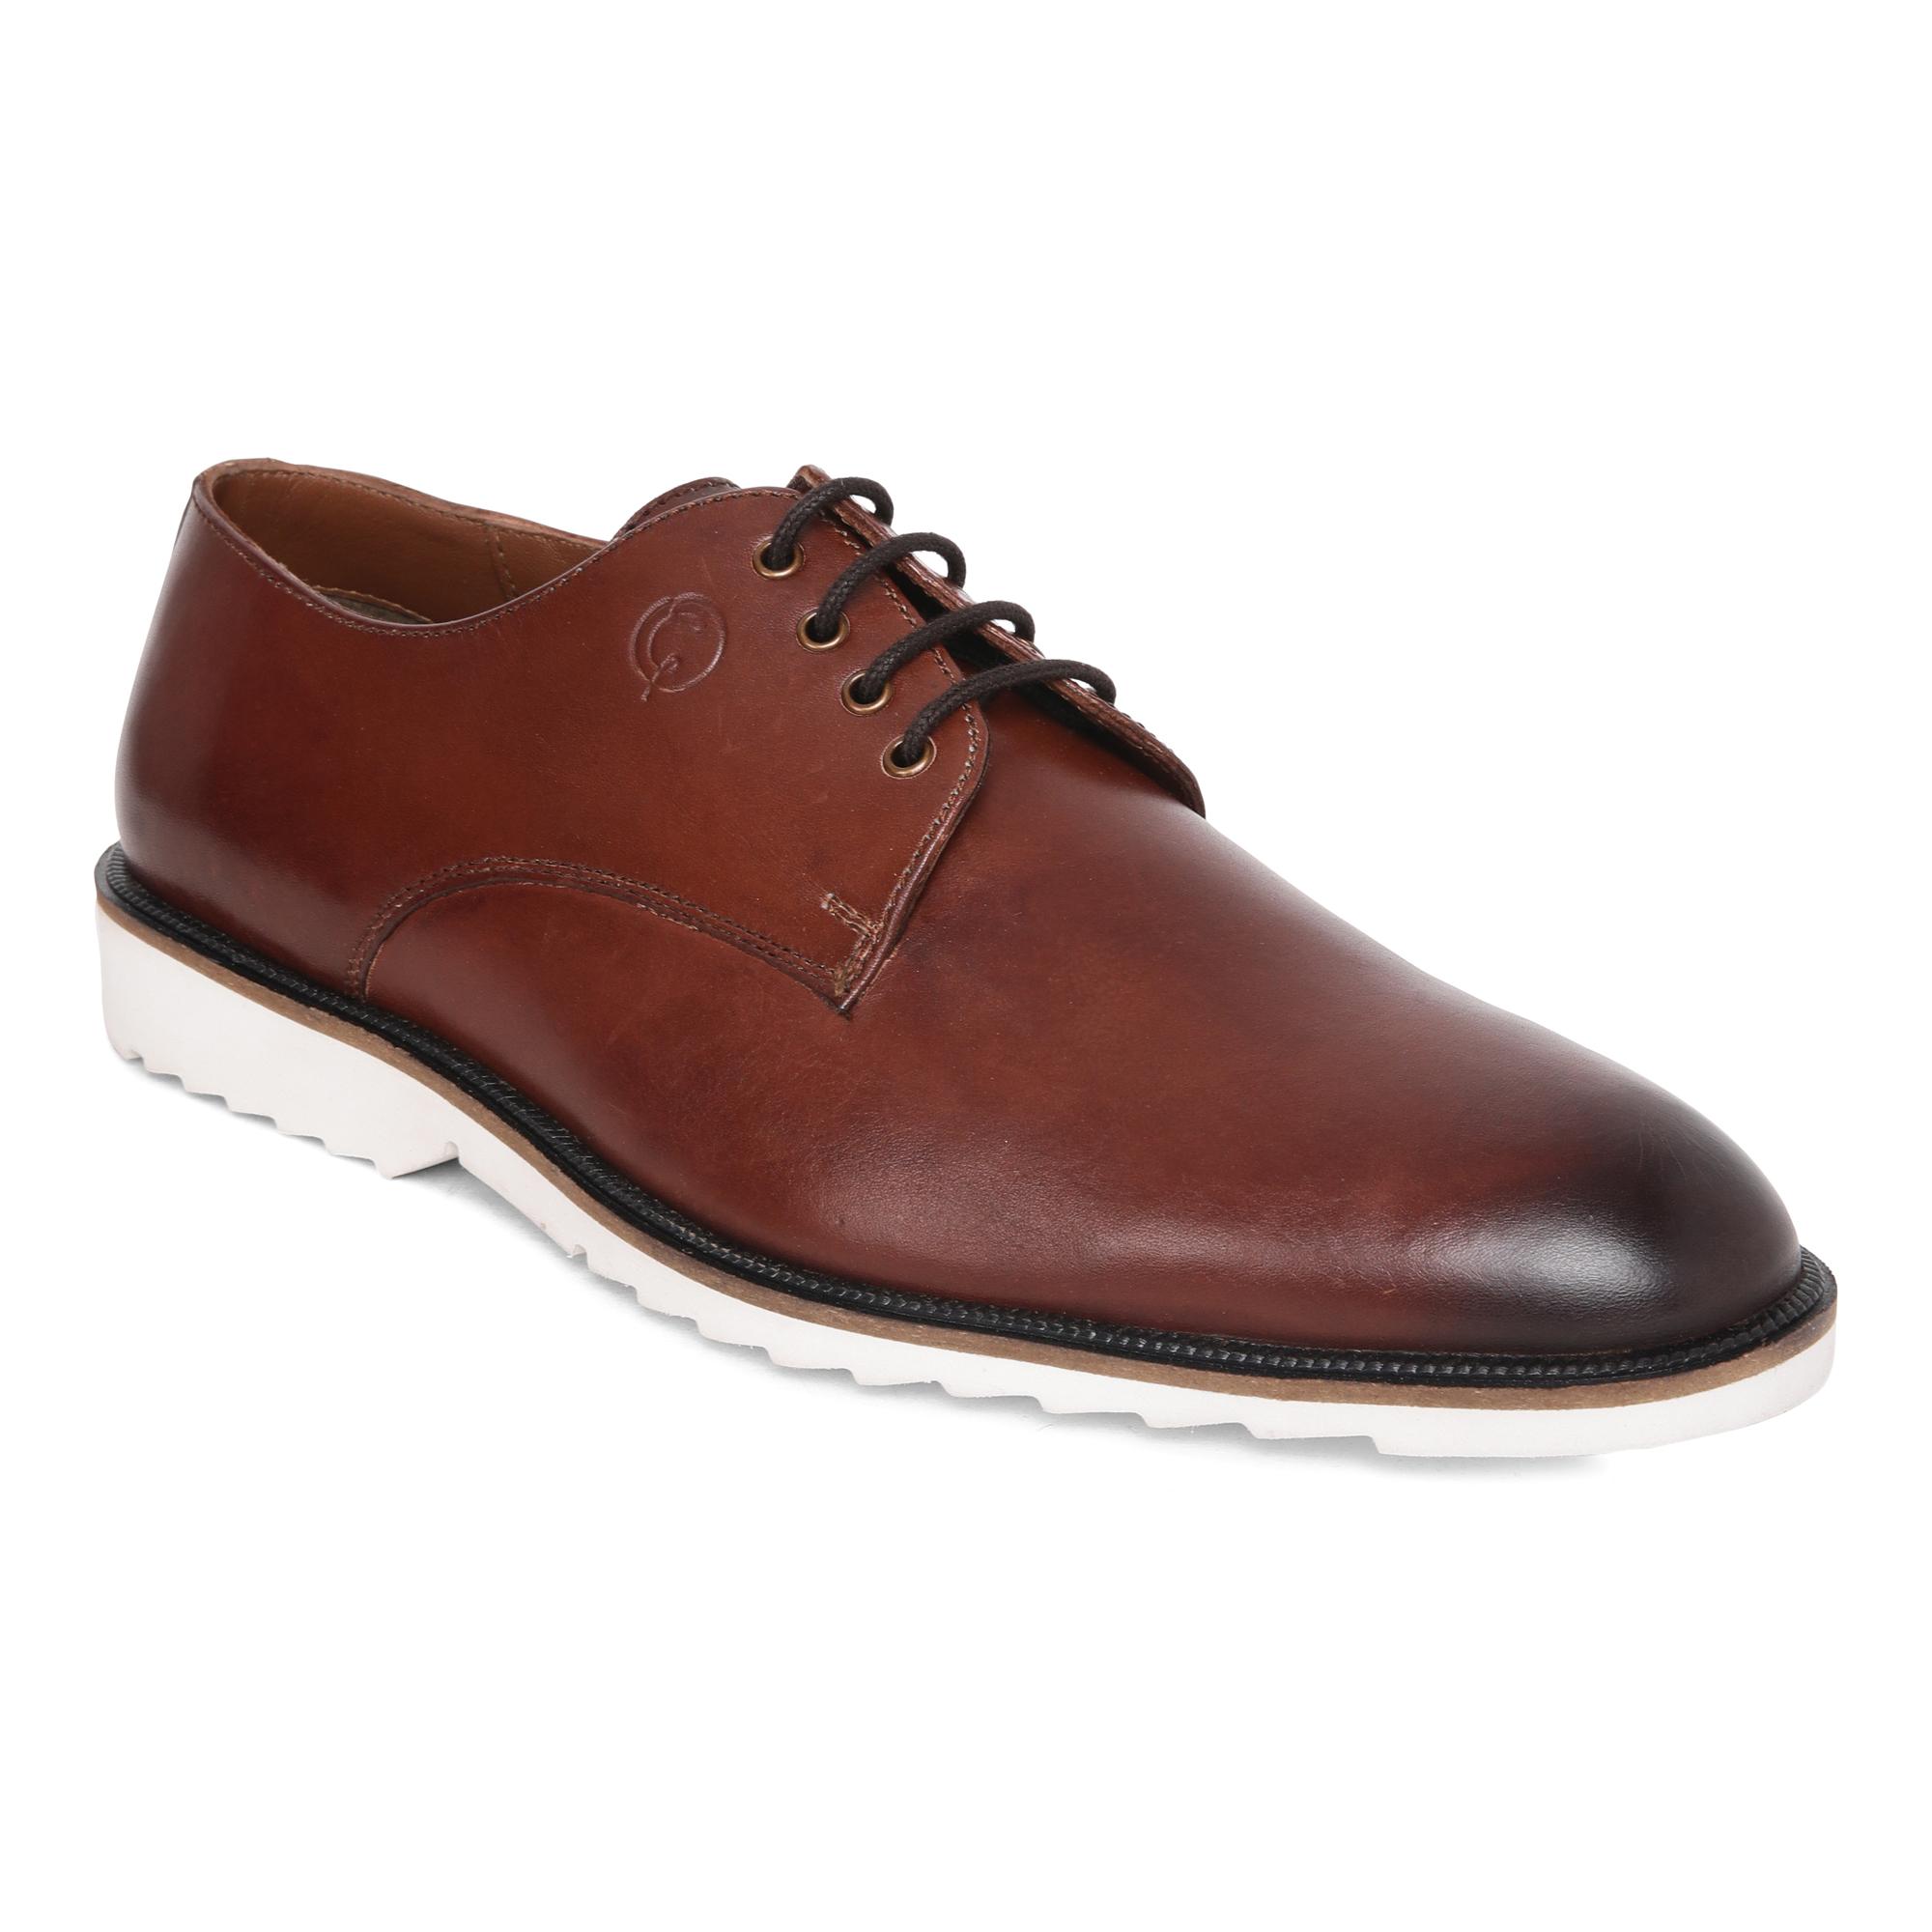 Carmicci   Carmicci Dark Tan Lifestyle Breathable Casual Shoes for Men - A1CR911D02A033